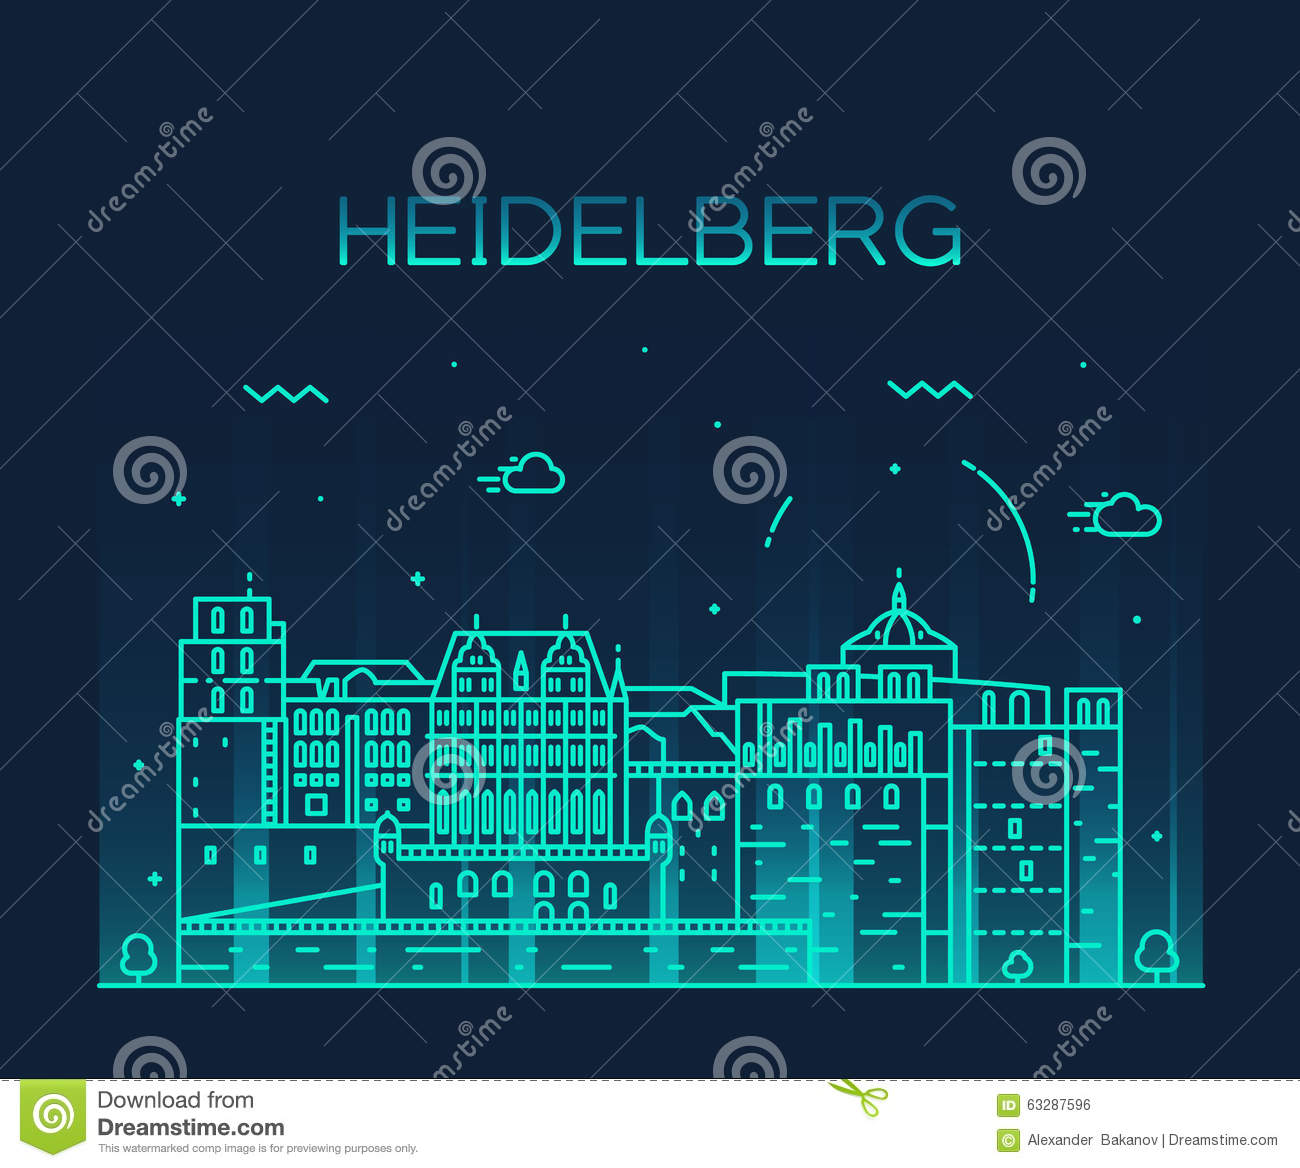 Heidelberg Skyline Vector Illustration Linear Stock Vector.